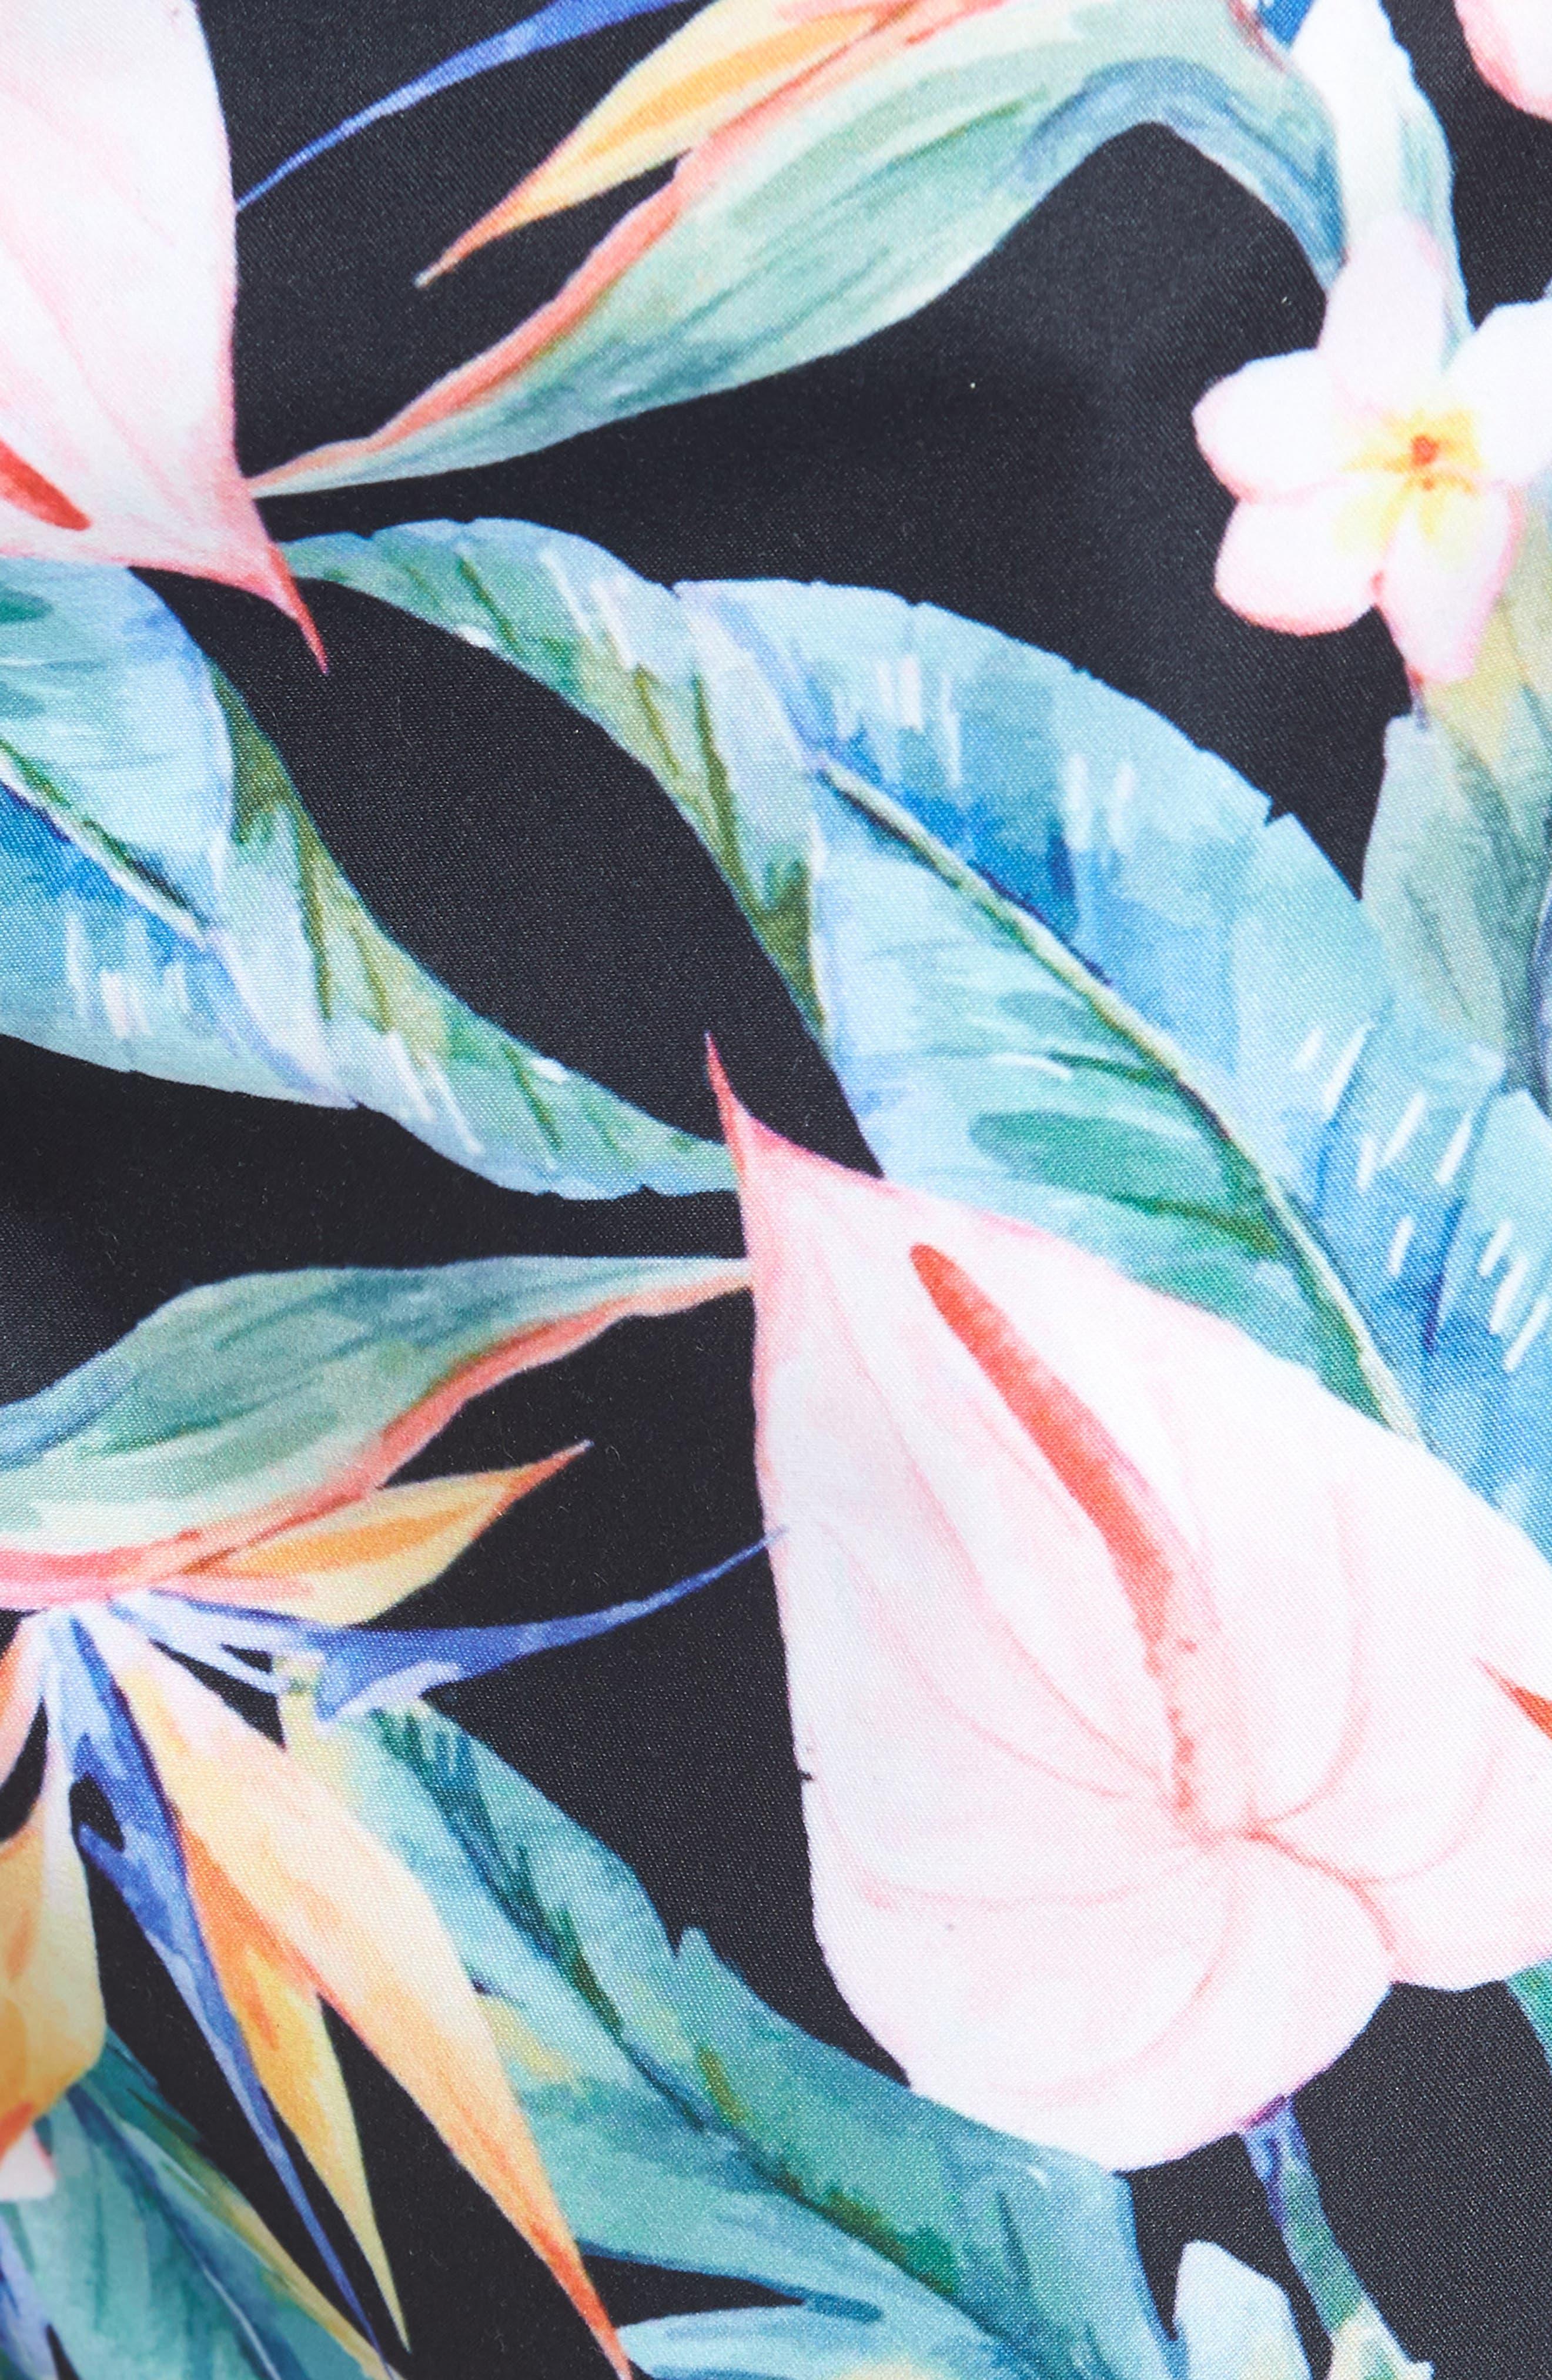 TRUNKS SURF & SWIM CO.,                             Floral Print Swim Trunks,                             Alternate thumbnail 5, color,                             400